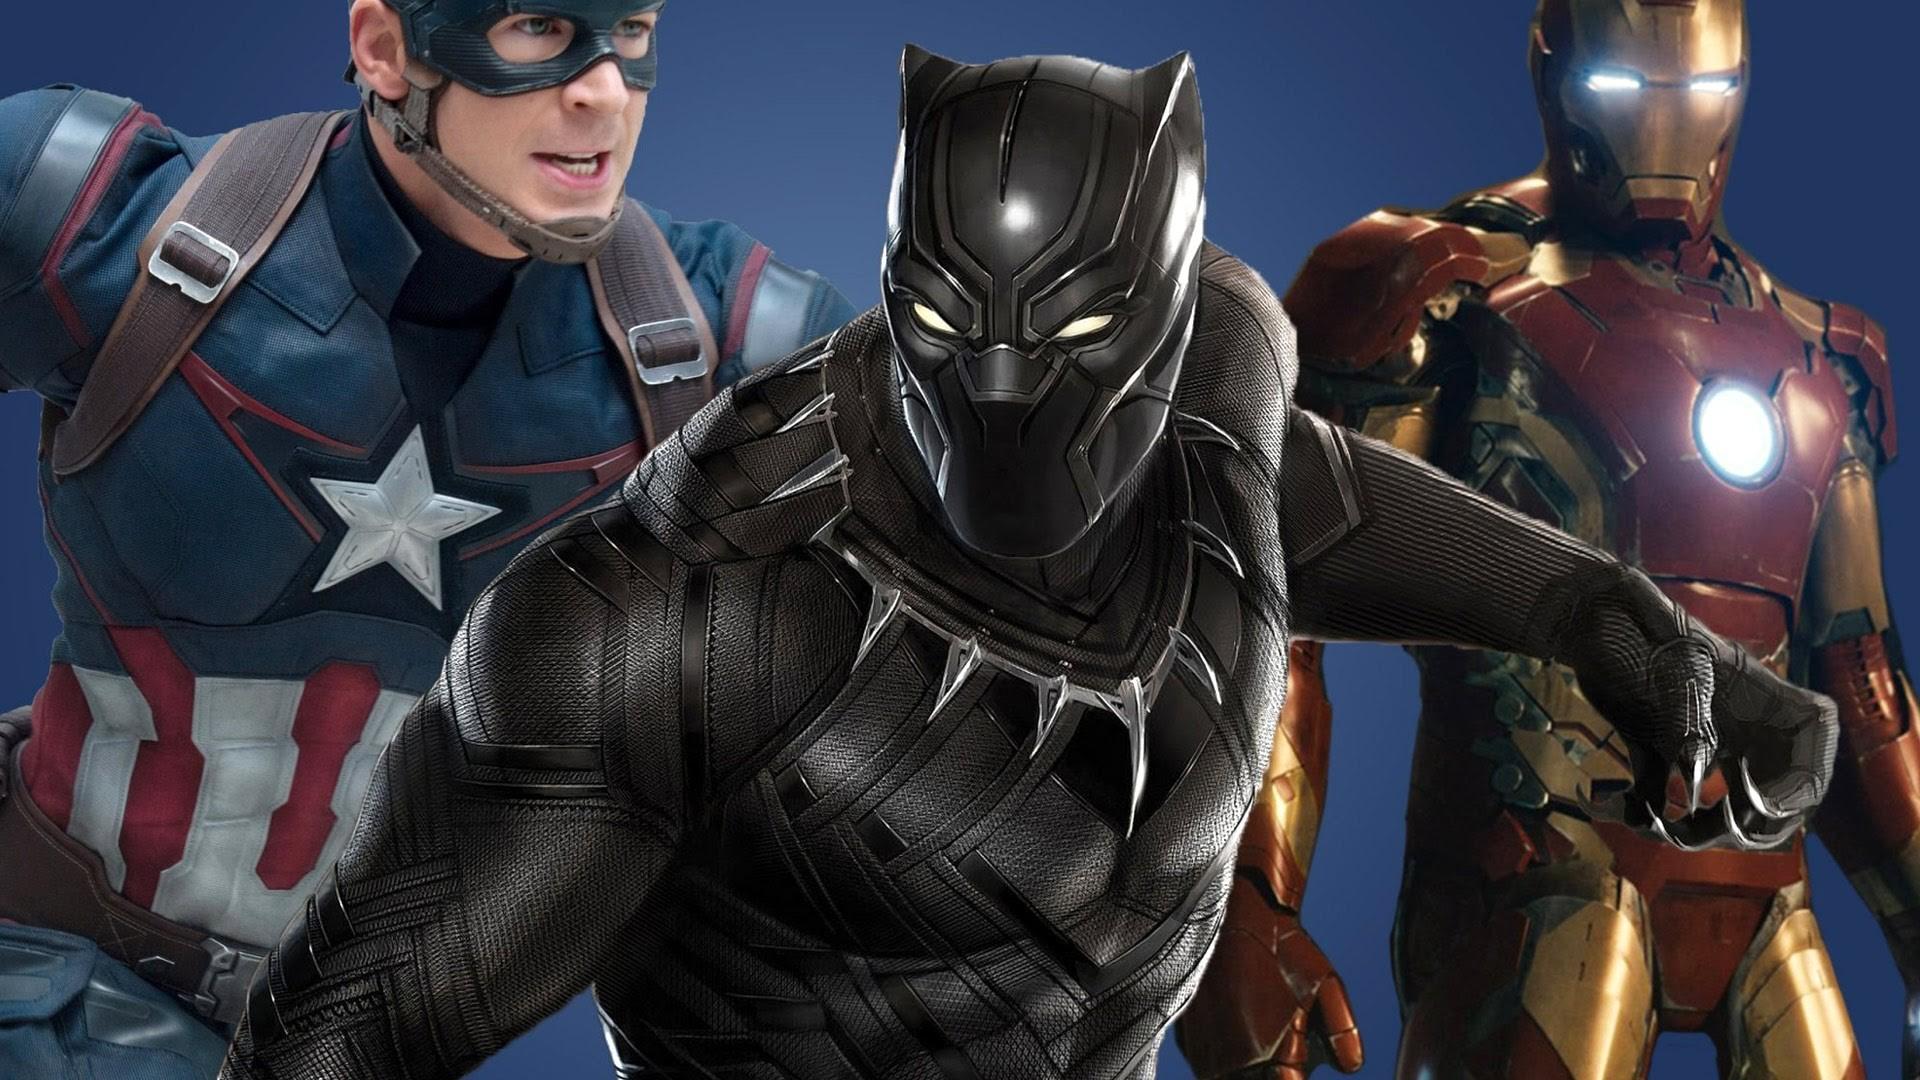 Ironman-captain-america-civil-war-black-panther-wallpaper-